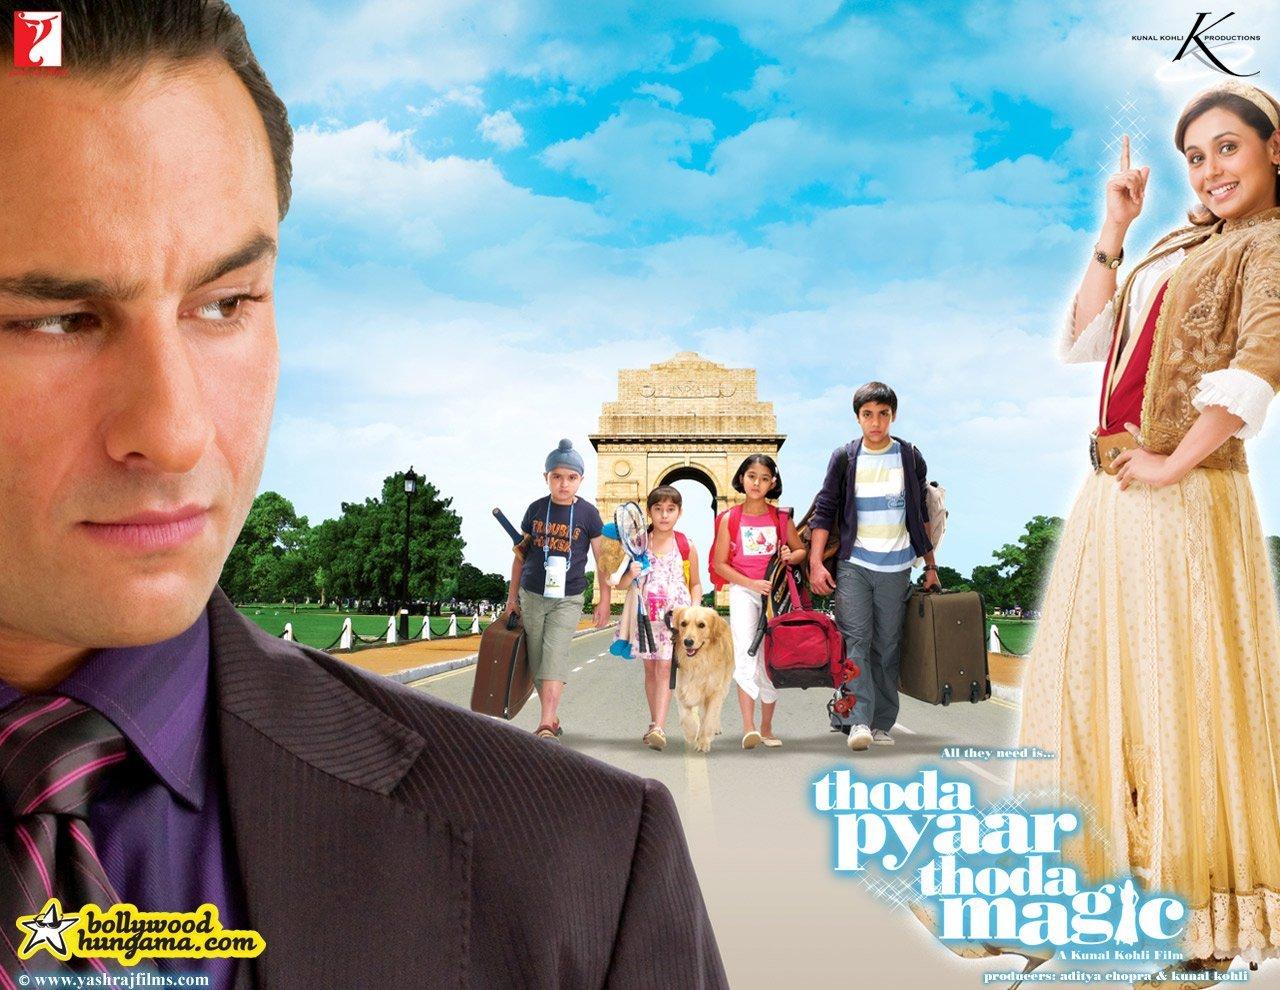 http://i.indiafm.com/posters/movies/08/thodapyaarthodamagic/still1.jpg